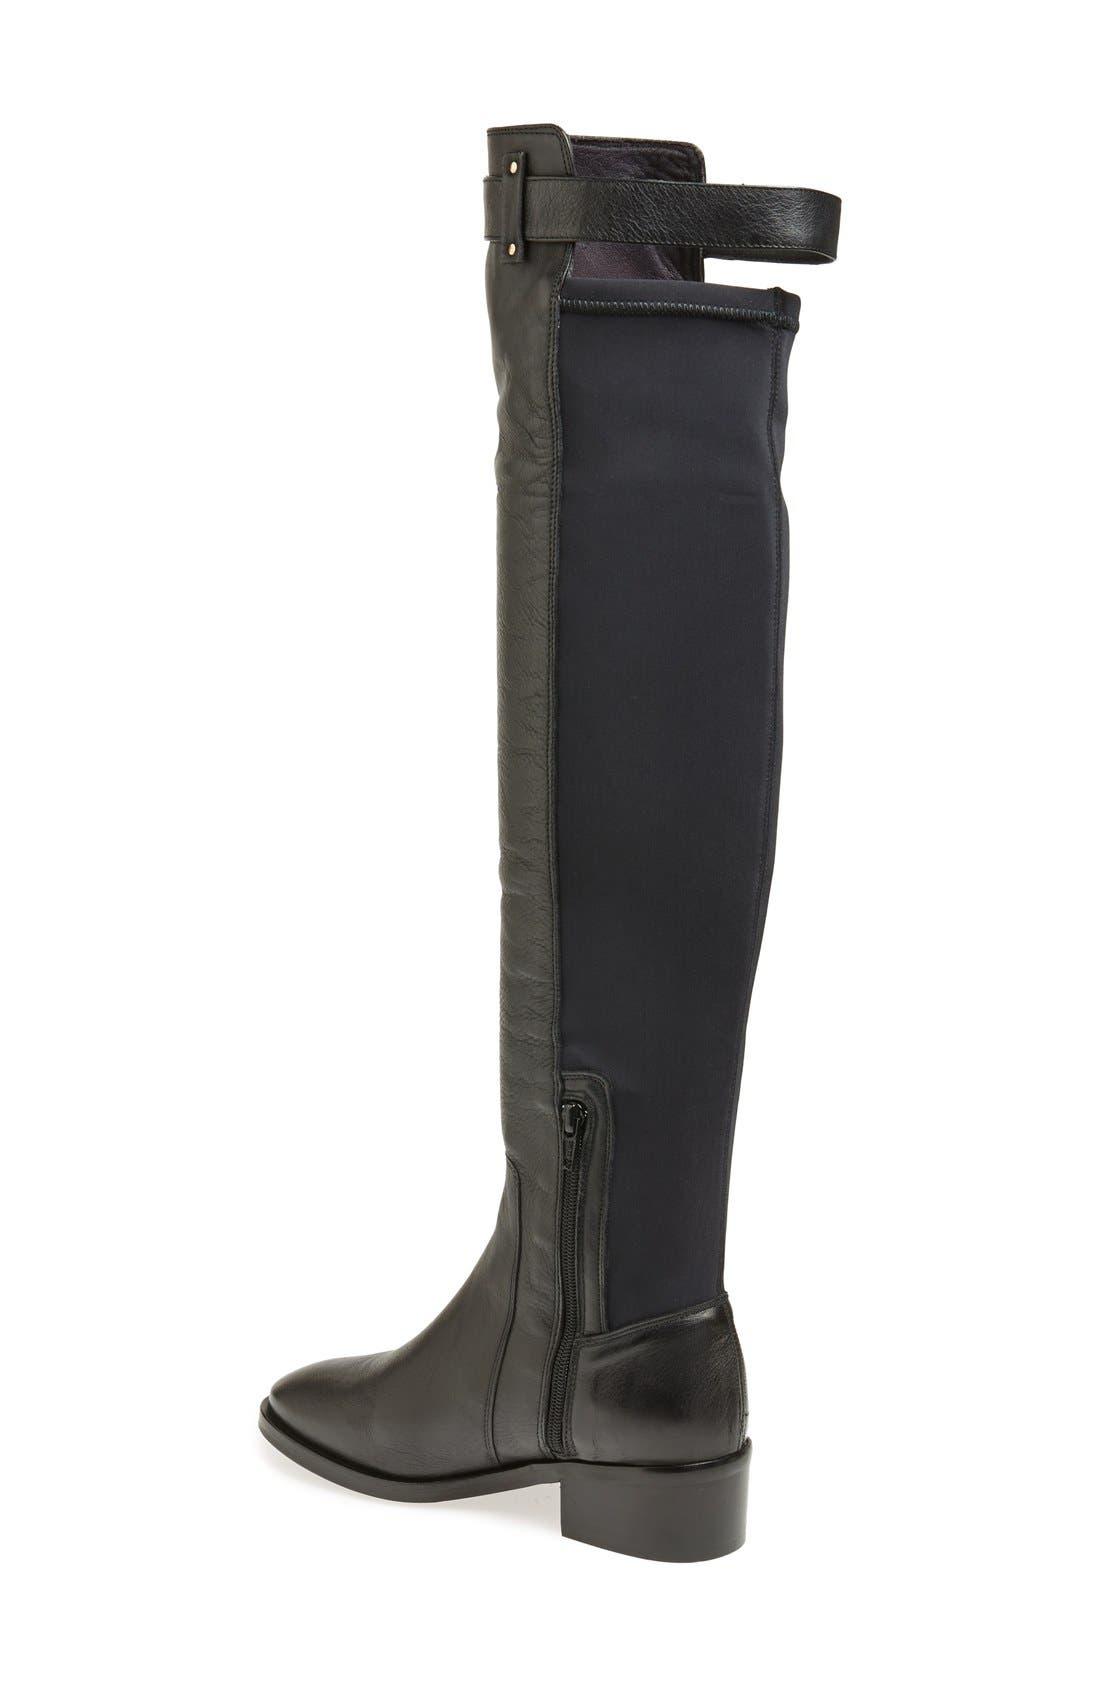 Alternate Image 2  - KG Kurt Geiger 'Vixen' Over the Knee Leather Boot (Women)